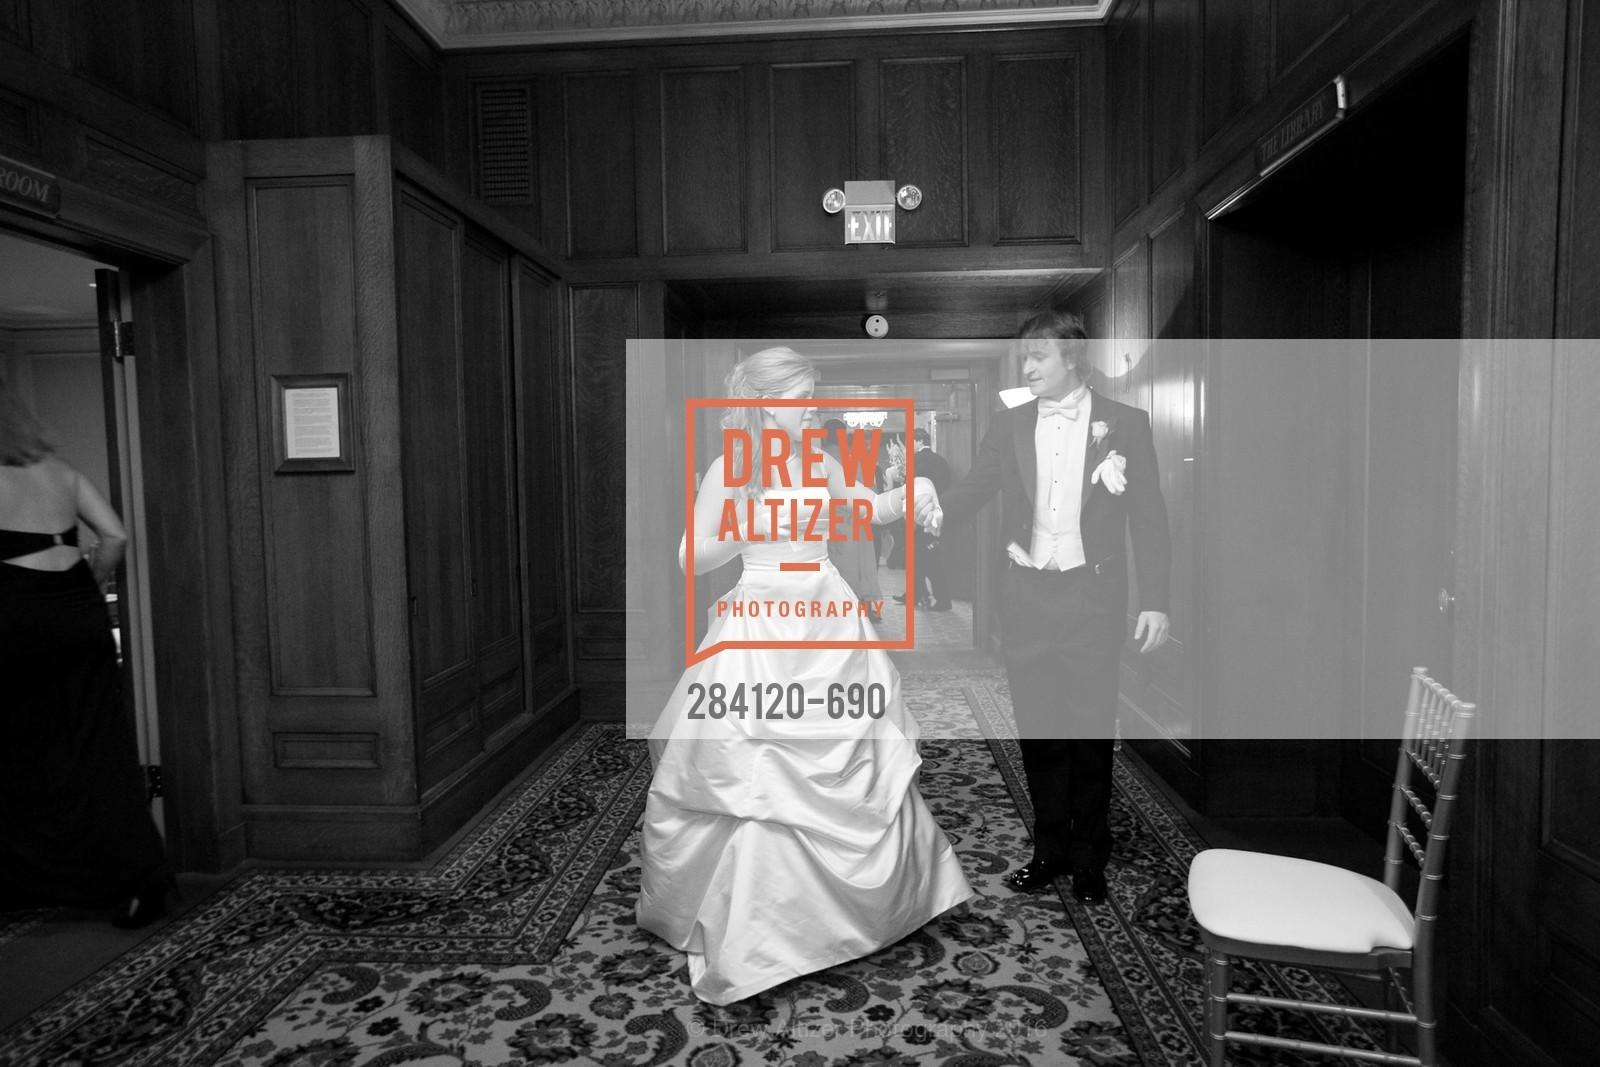 Averell Edmondson, Jeff Hunt, 2009 Debutante Ball, Unknown, July 4th, 2008,Drew Altizer, Drew Altizer Photography, full-service agency, private events, San Francisco photographer, photographer california